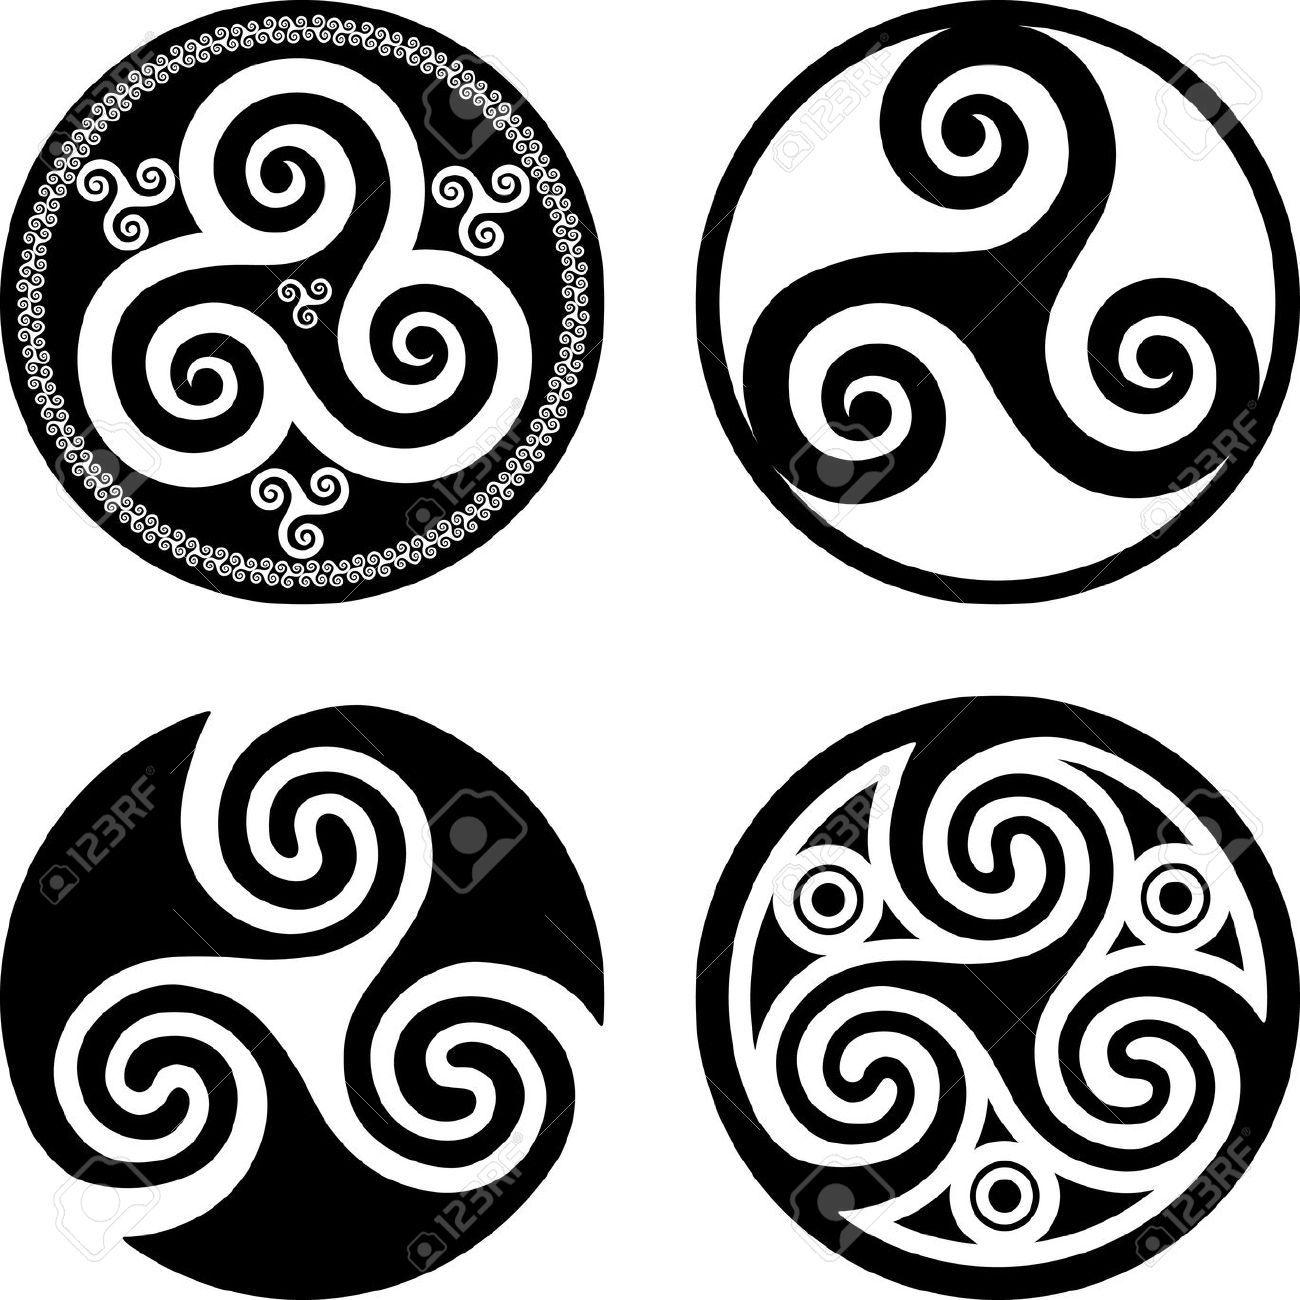 Triple spiral celtic triskele is sometimes called the spiral of triple spiral celtic triskele is sometimes called the spiral of life it was found in newgrange site in bronze age or older ireland it remain biocorpaavc